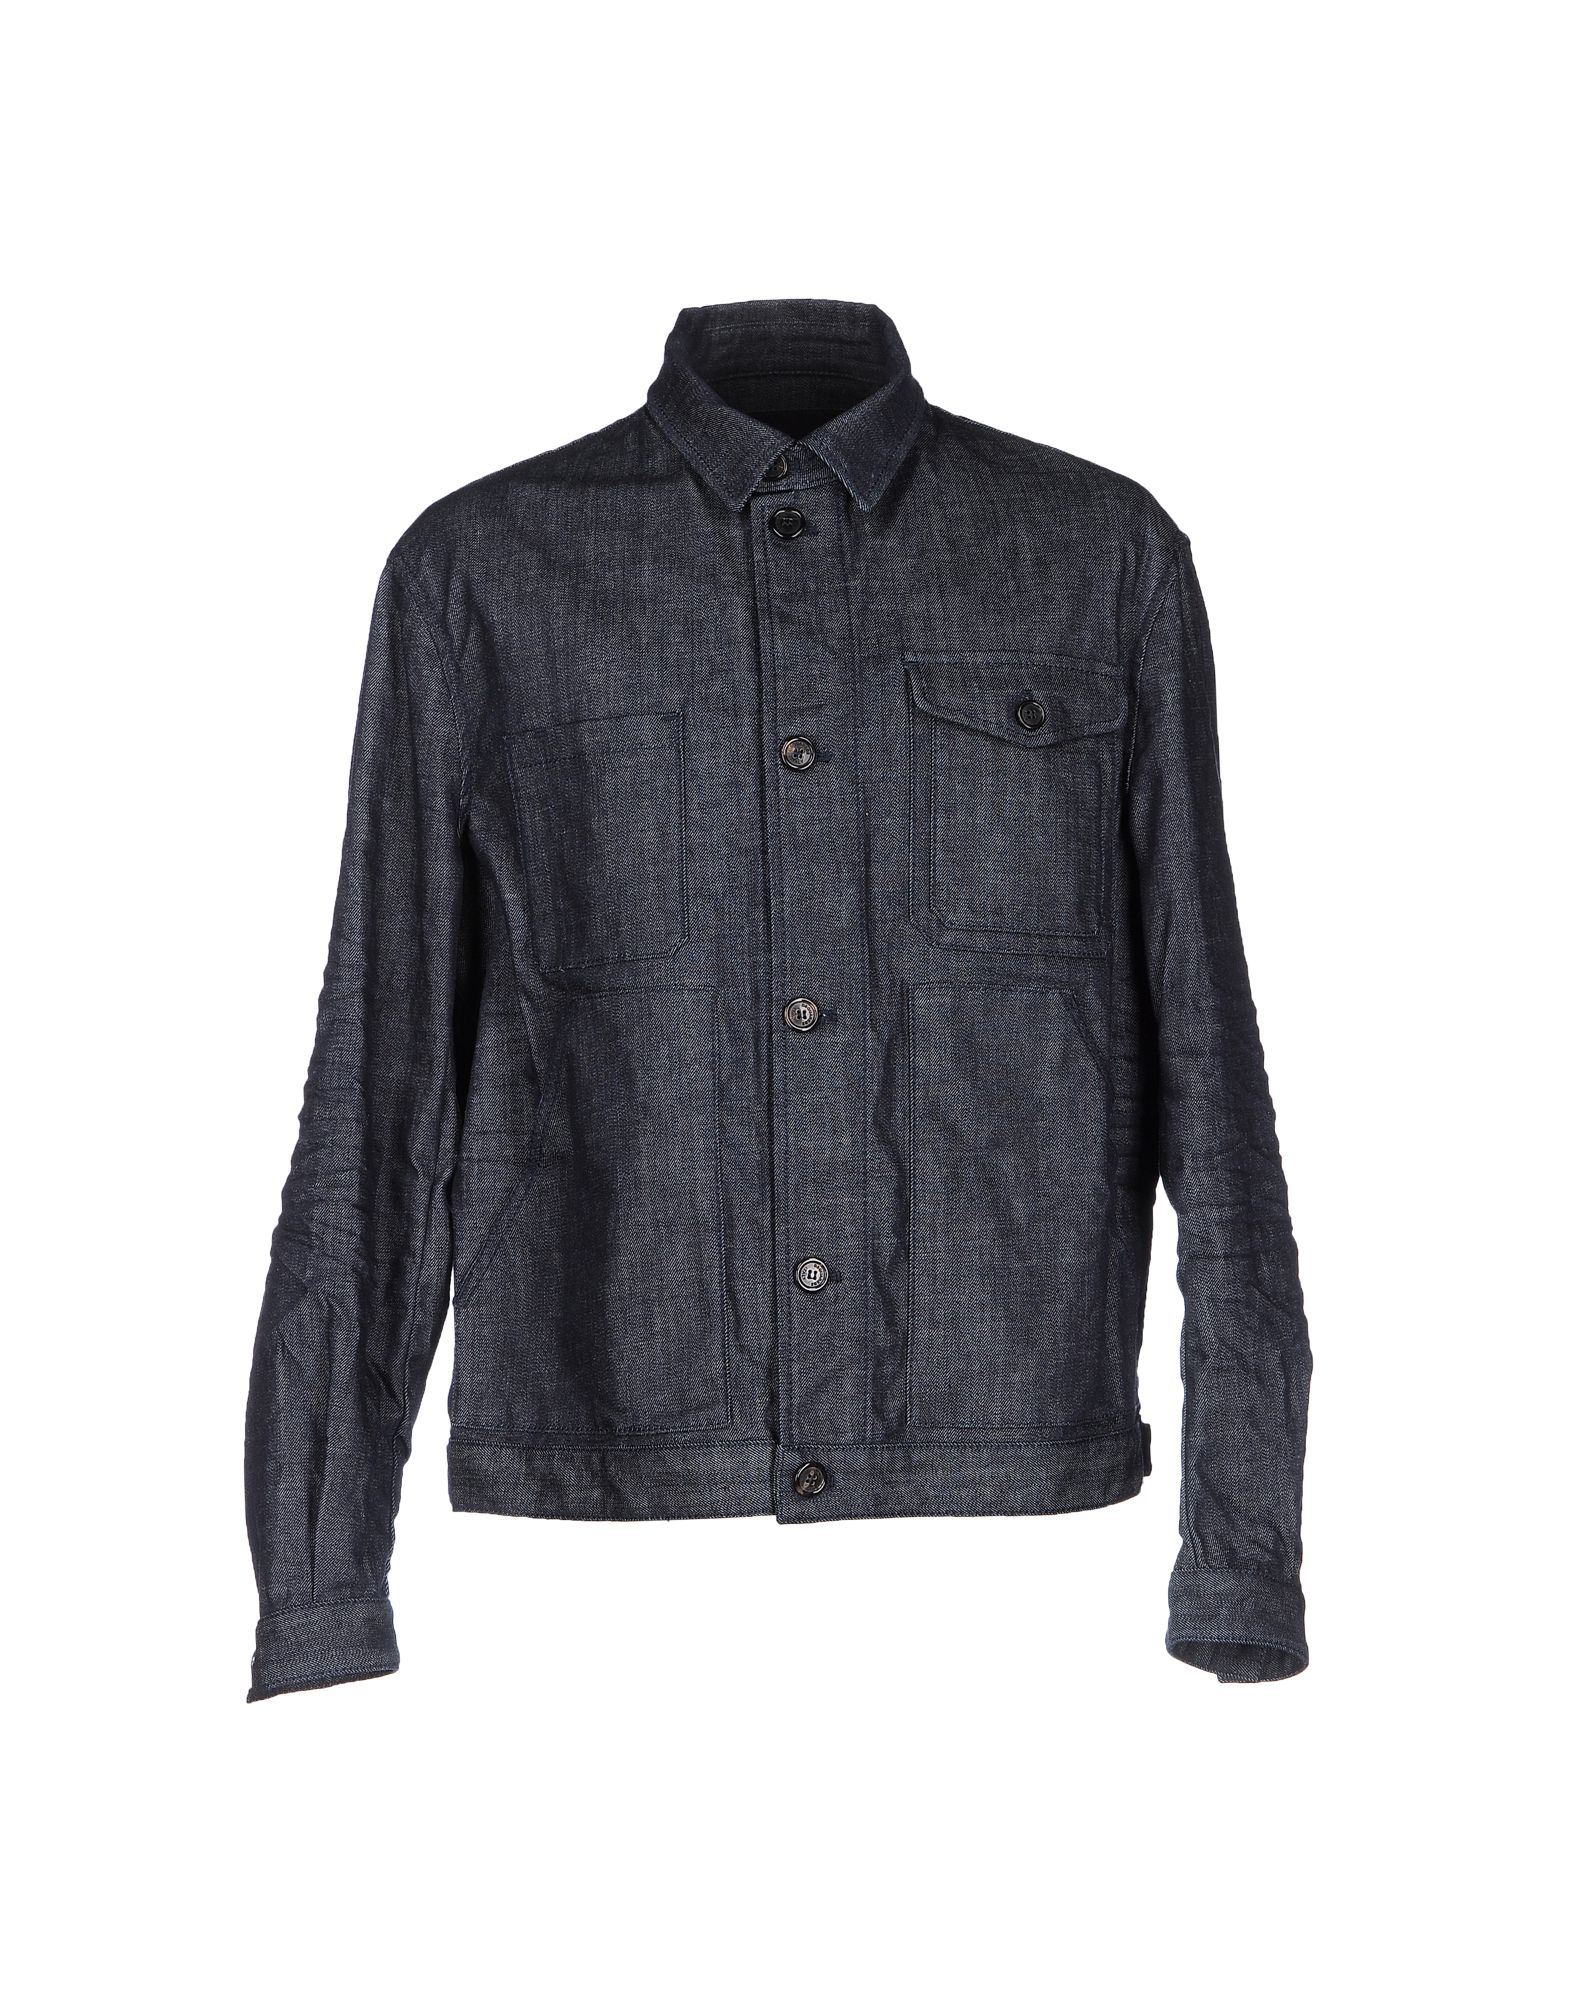 цена  DSQUARED2 Джинсовая верхняя одежда  онлайн в 2017 году